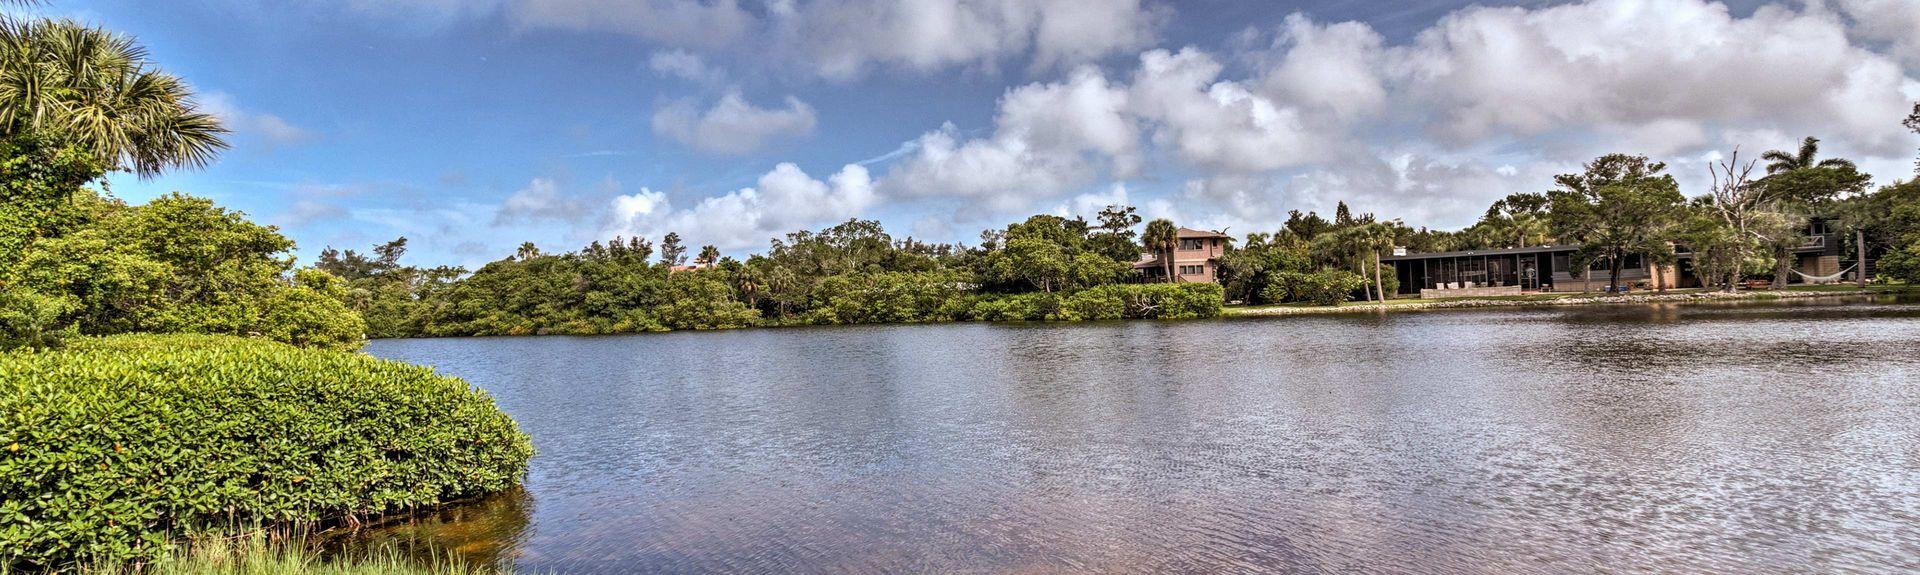 Jim Neville Marine Preserve, Siesta Key, FL, USA